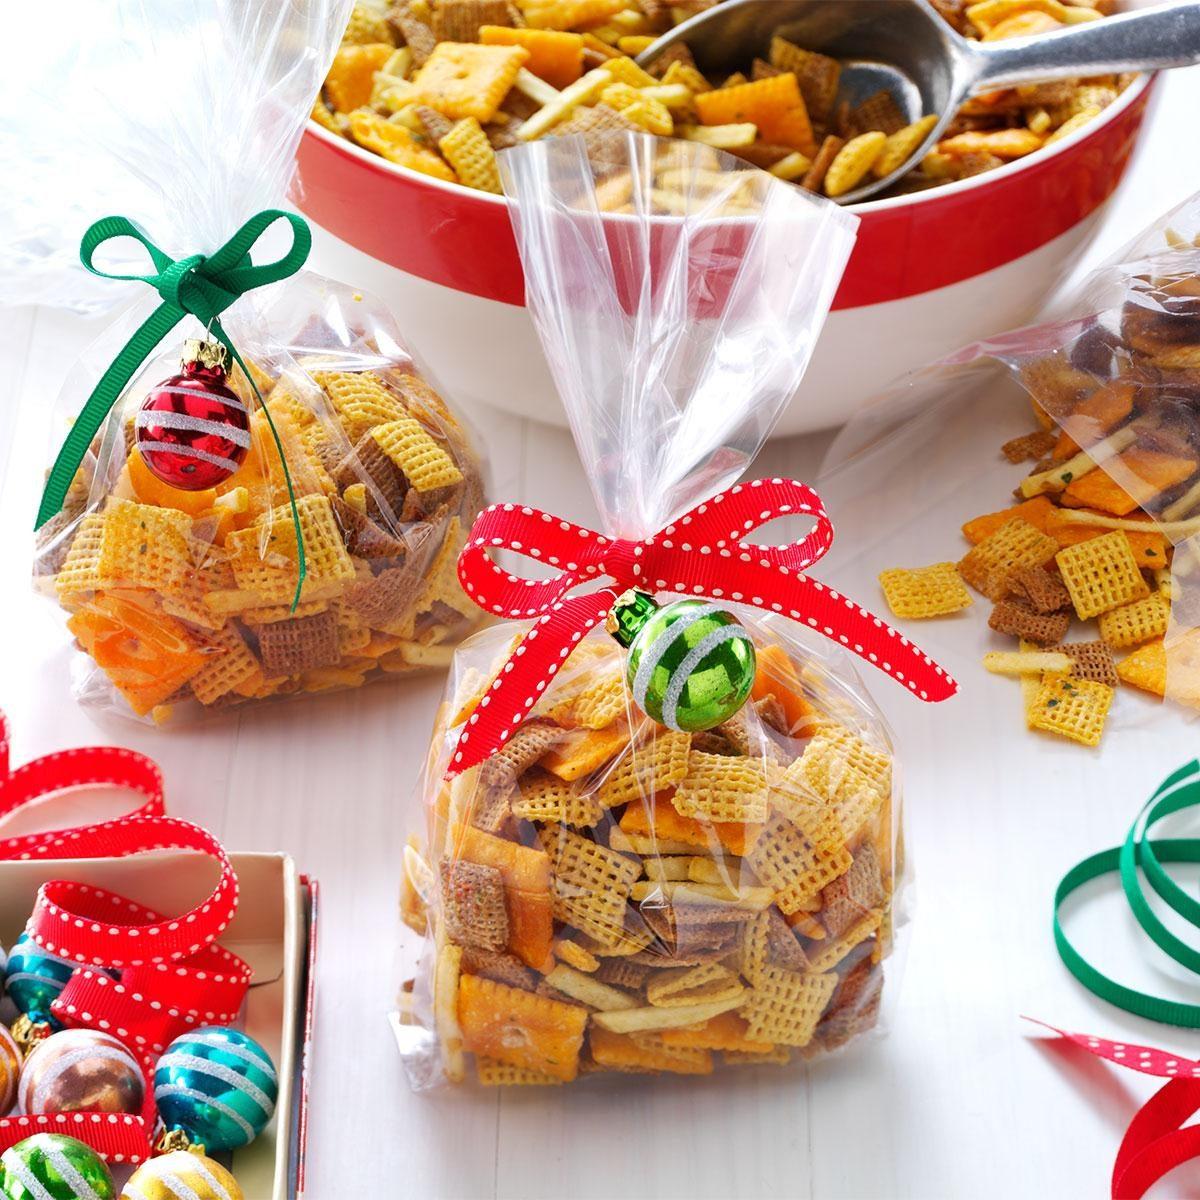 30 Savory Food Gifts for Christmas | Taste of Home